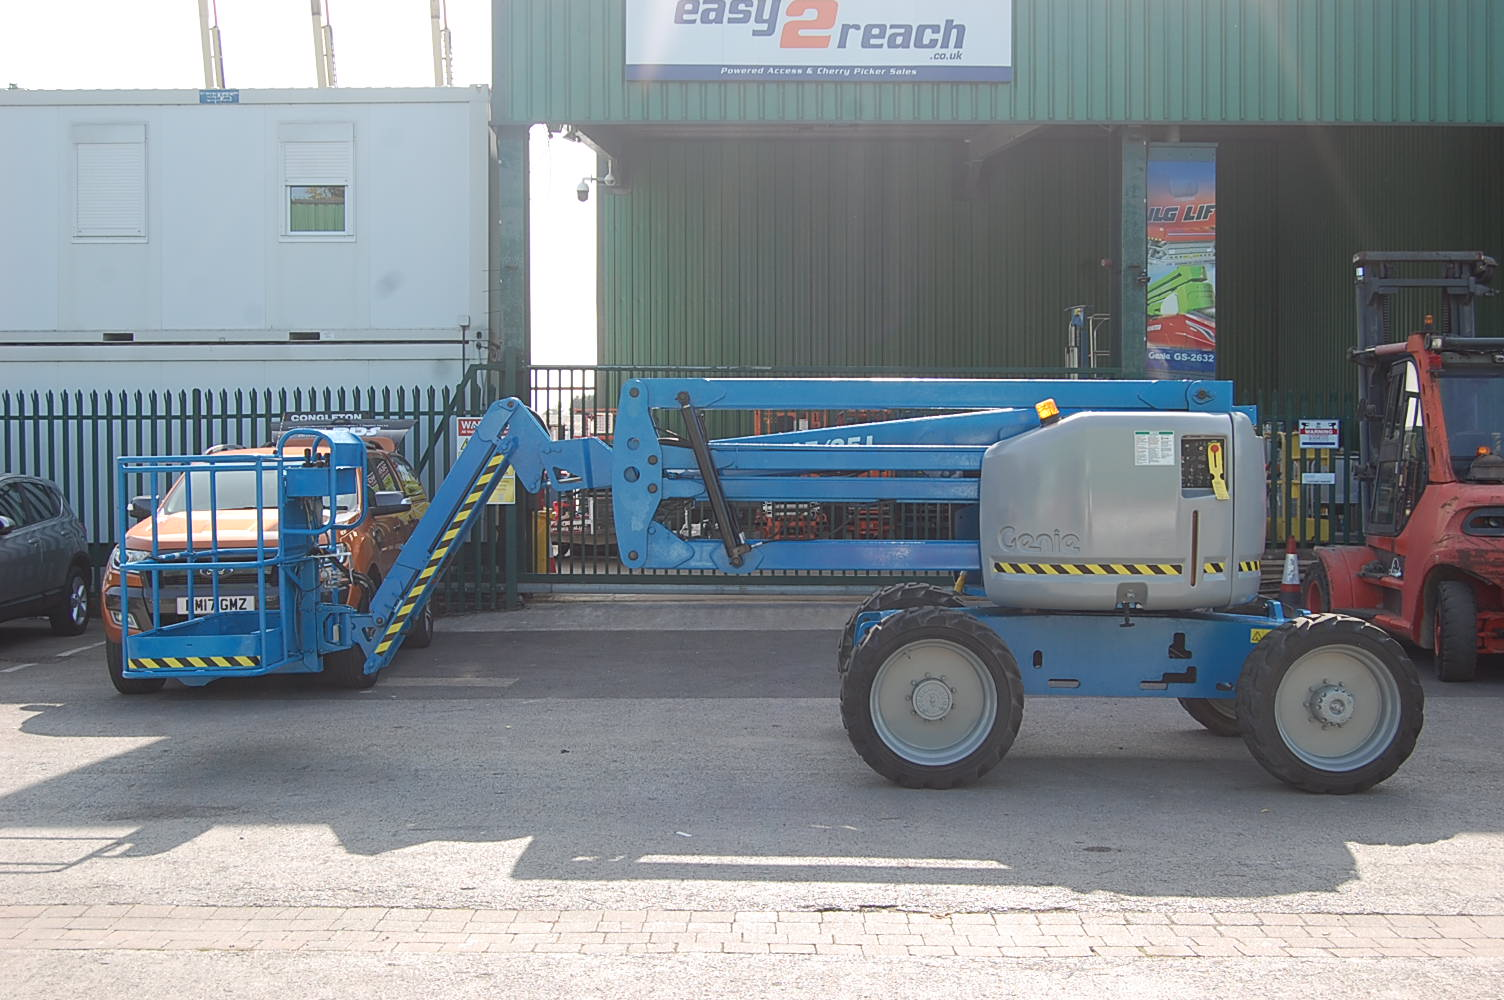 2006 Genie Z45/25J Rough Terrain Diesel Boom Lift